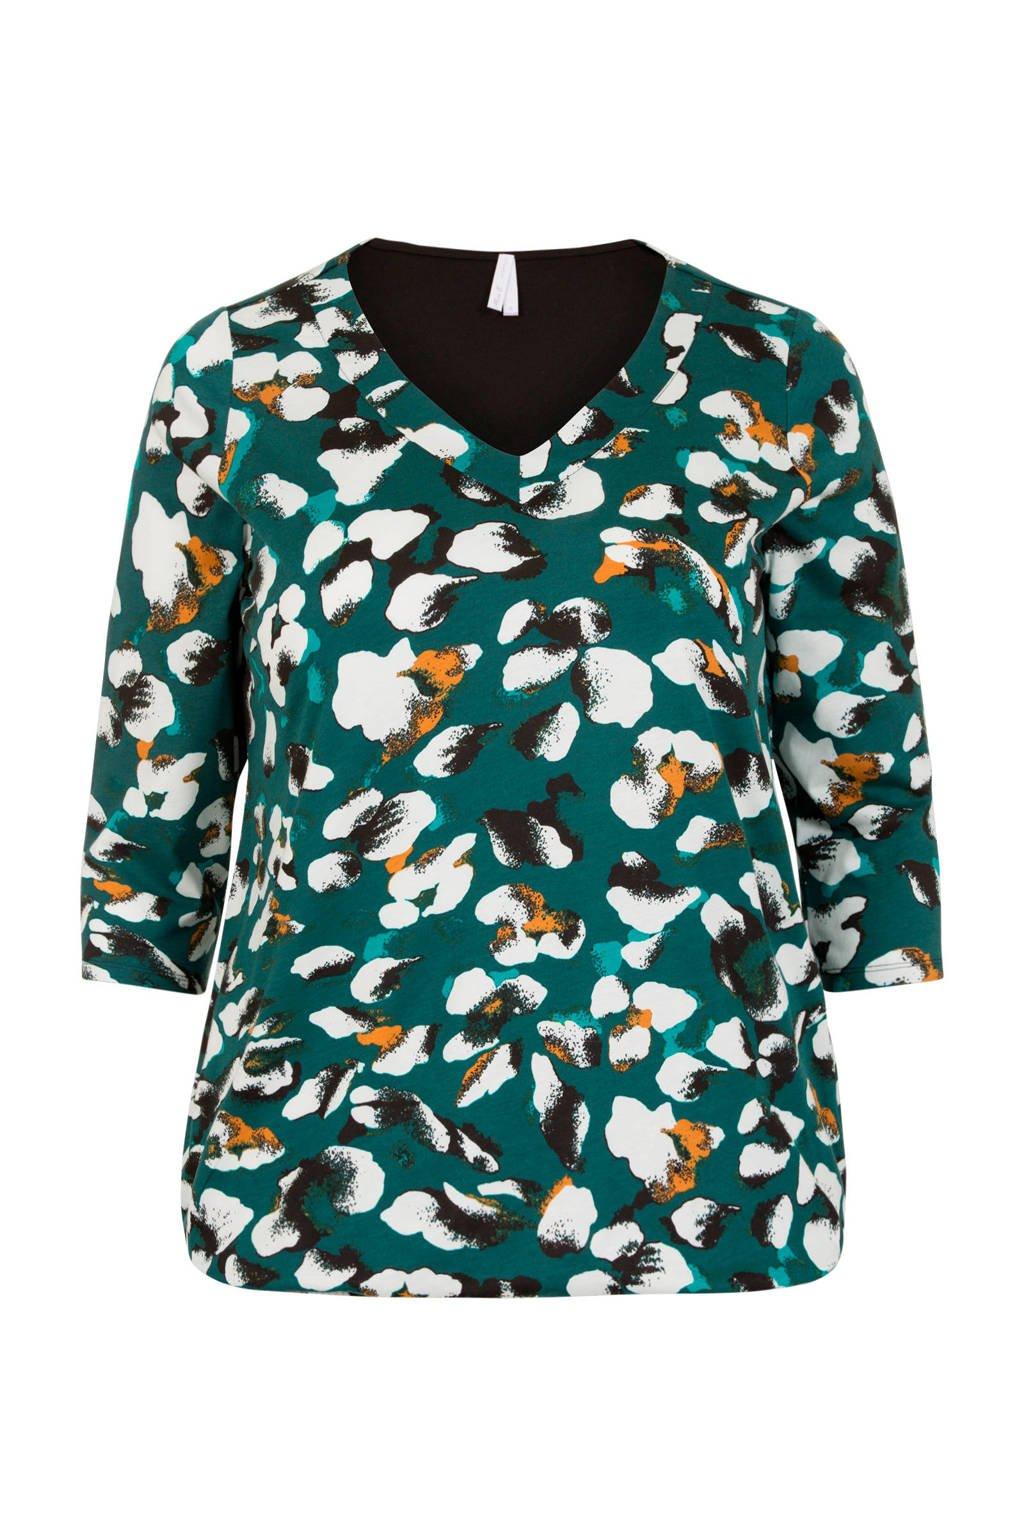 Miss Etam Plus geweven T-shirt met all over print groen, Groen